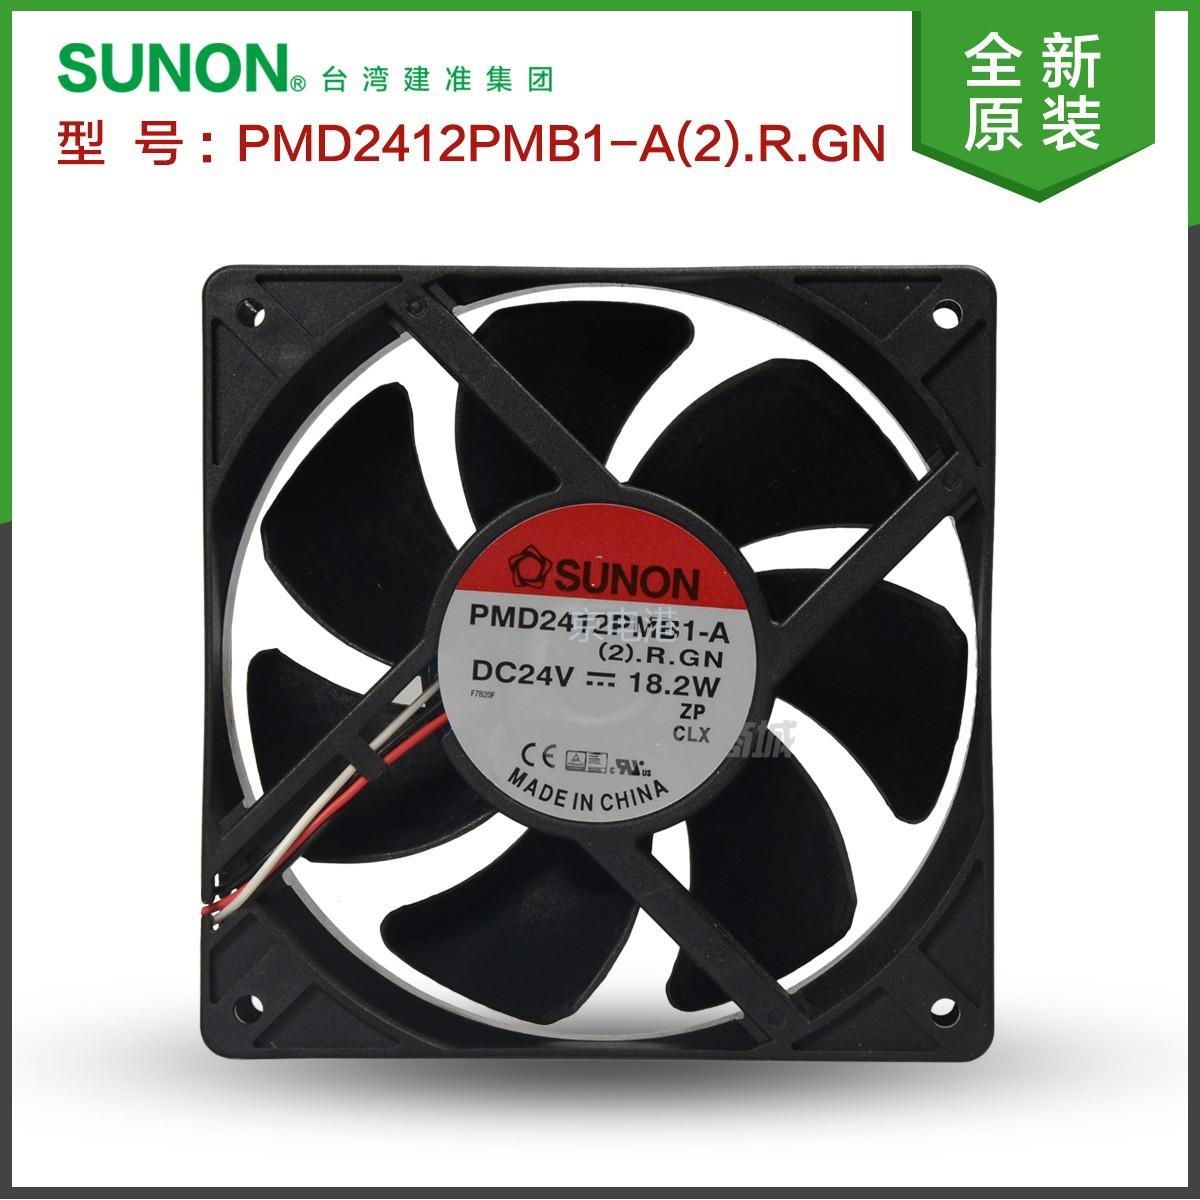 SUNON建准 PMD2412PMB1-A(2).R.GN 24V 3线 直流风扇 变频器风扇